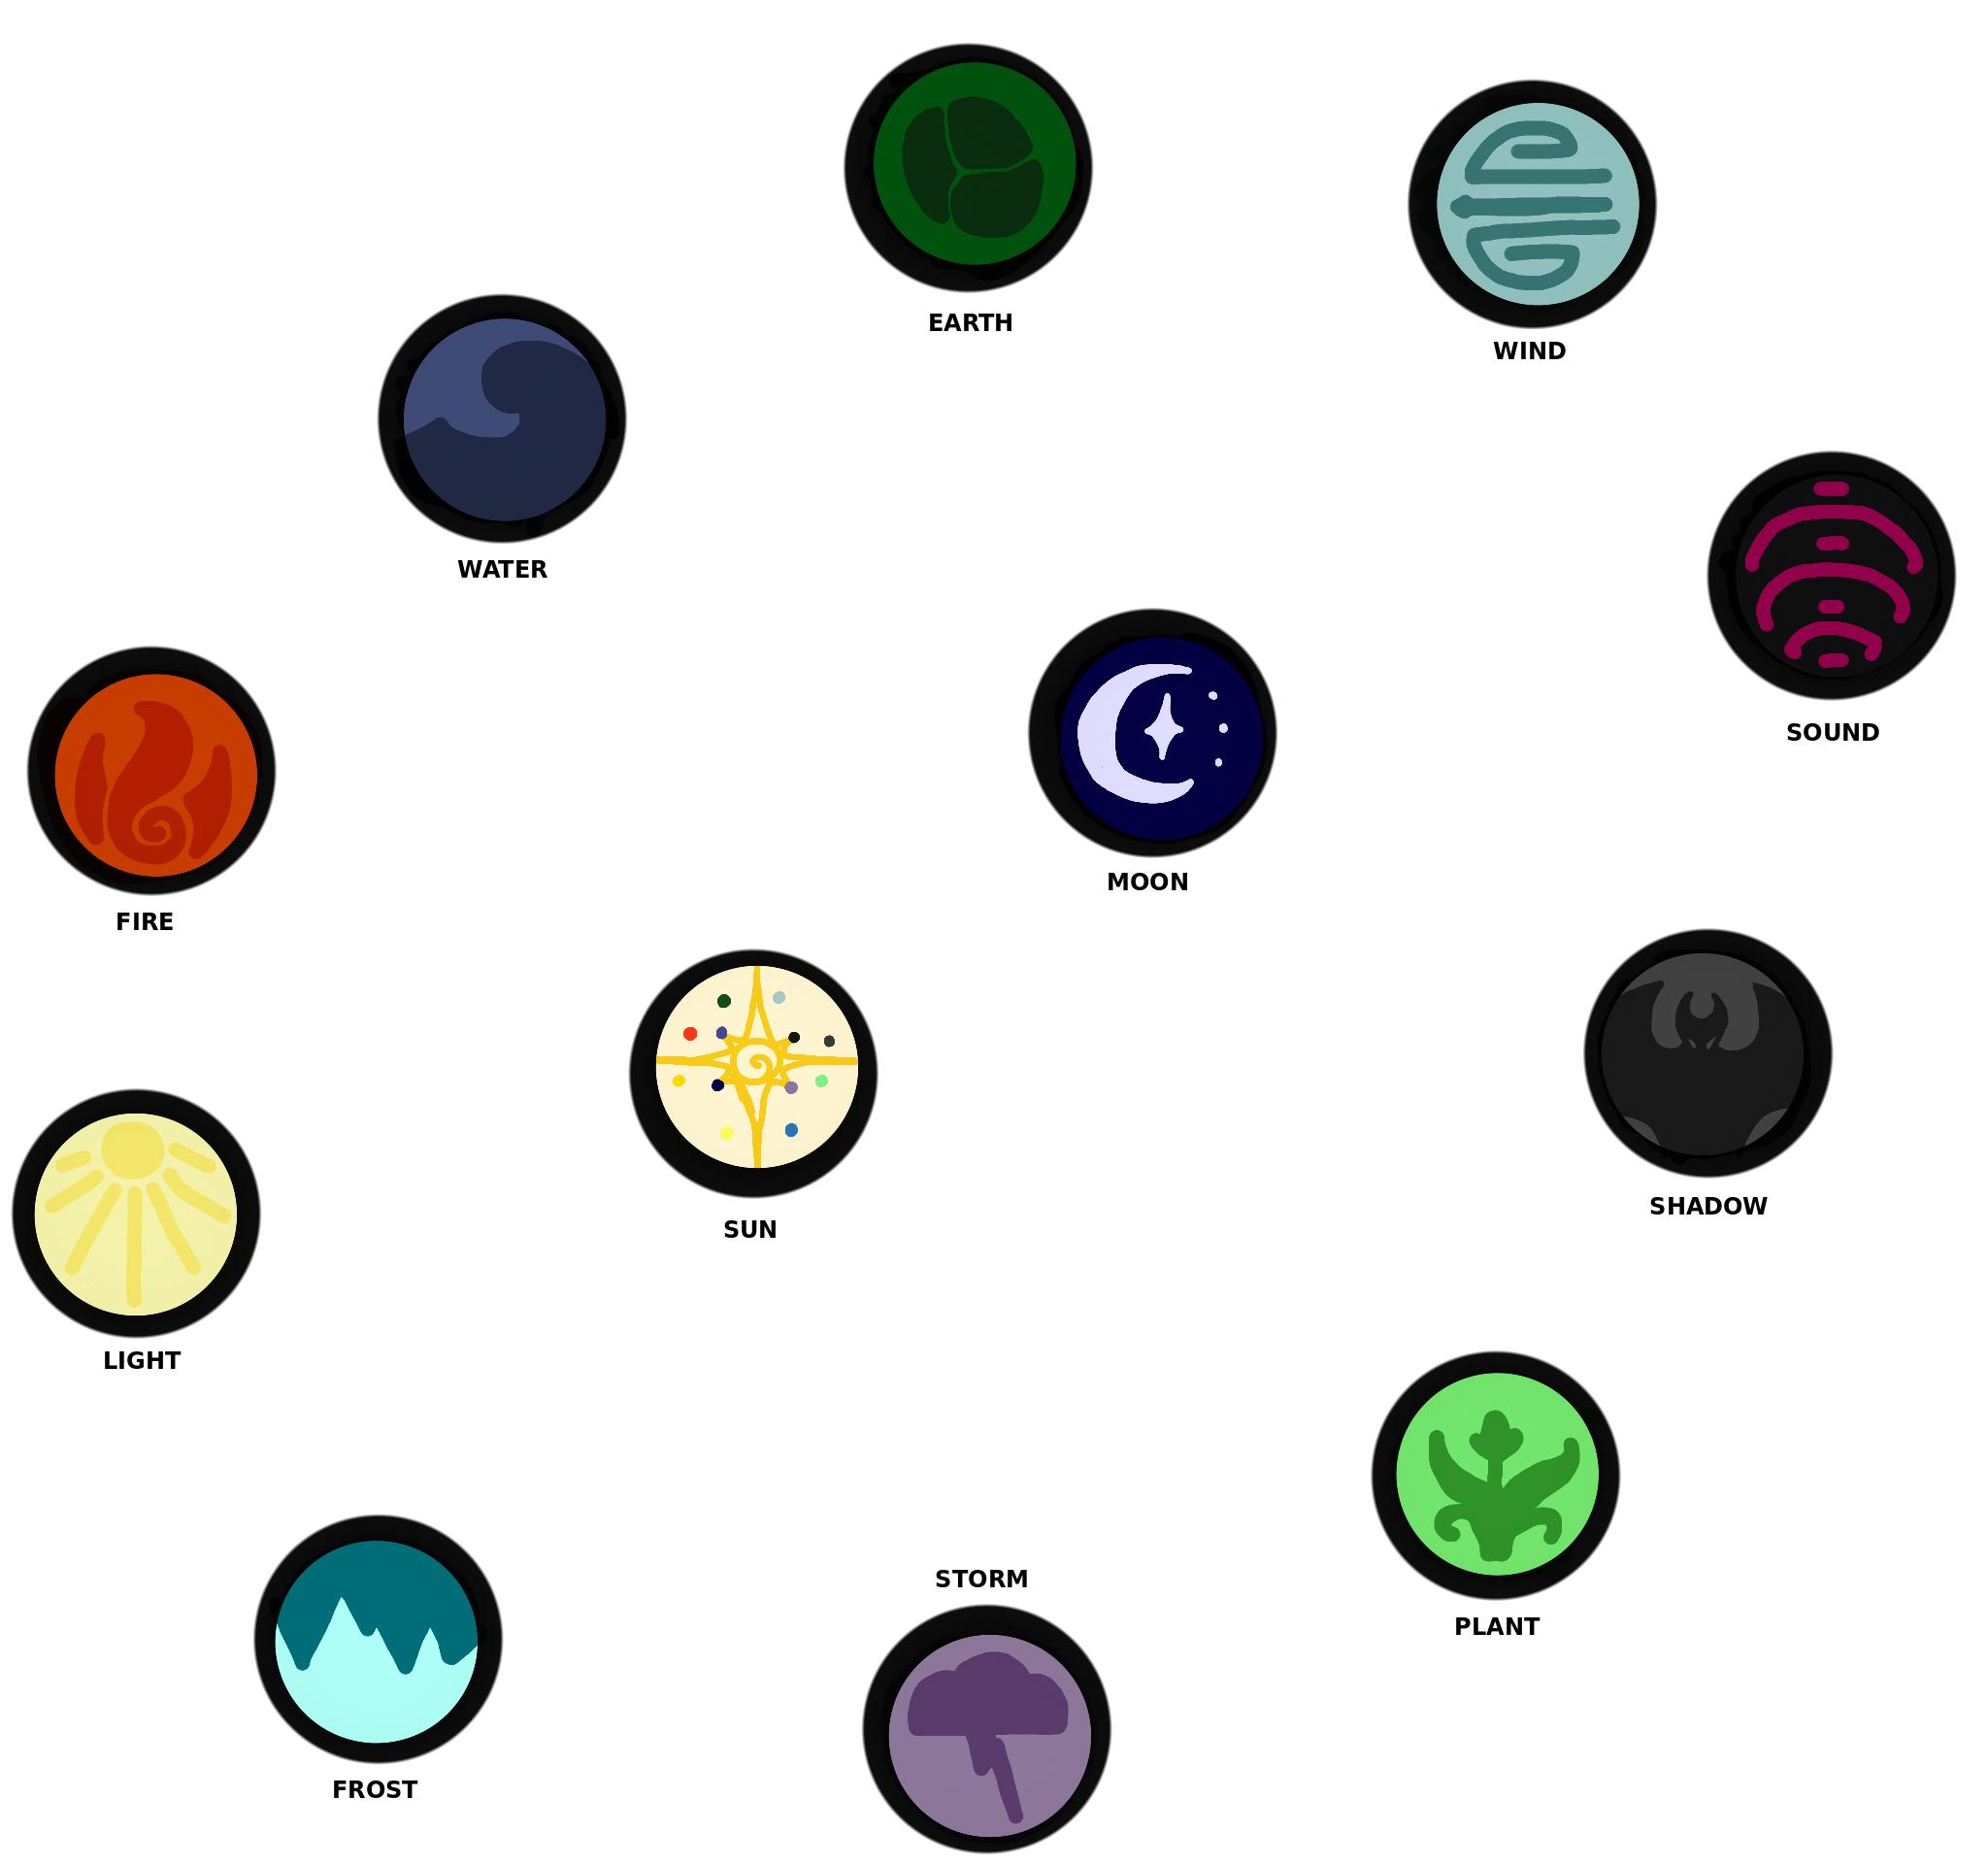 All Elements Of Art : All element symbols the